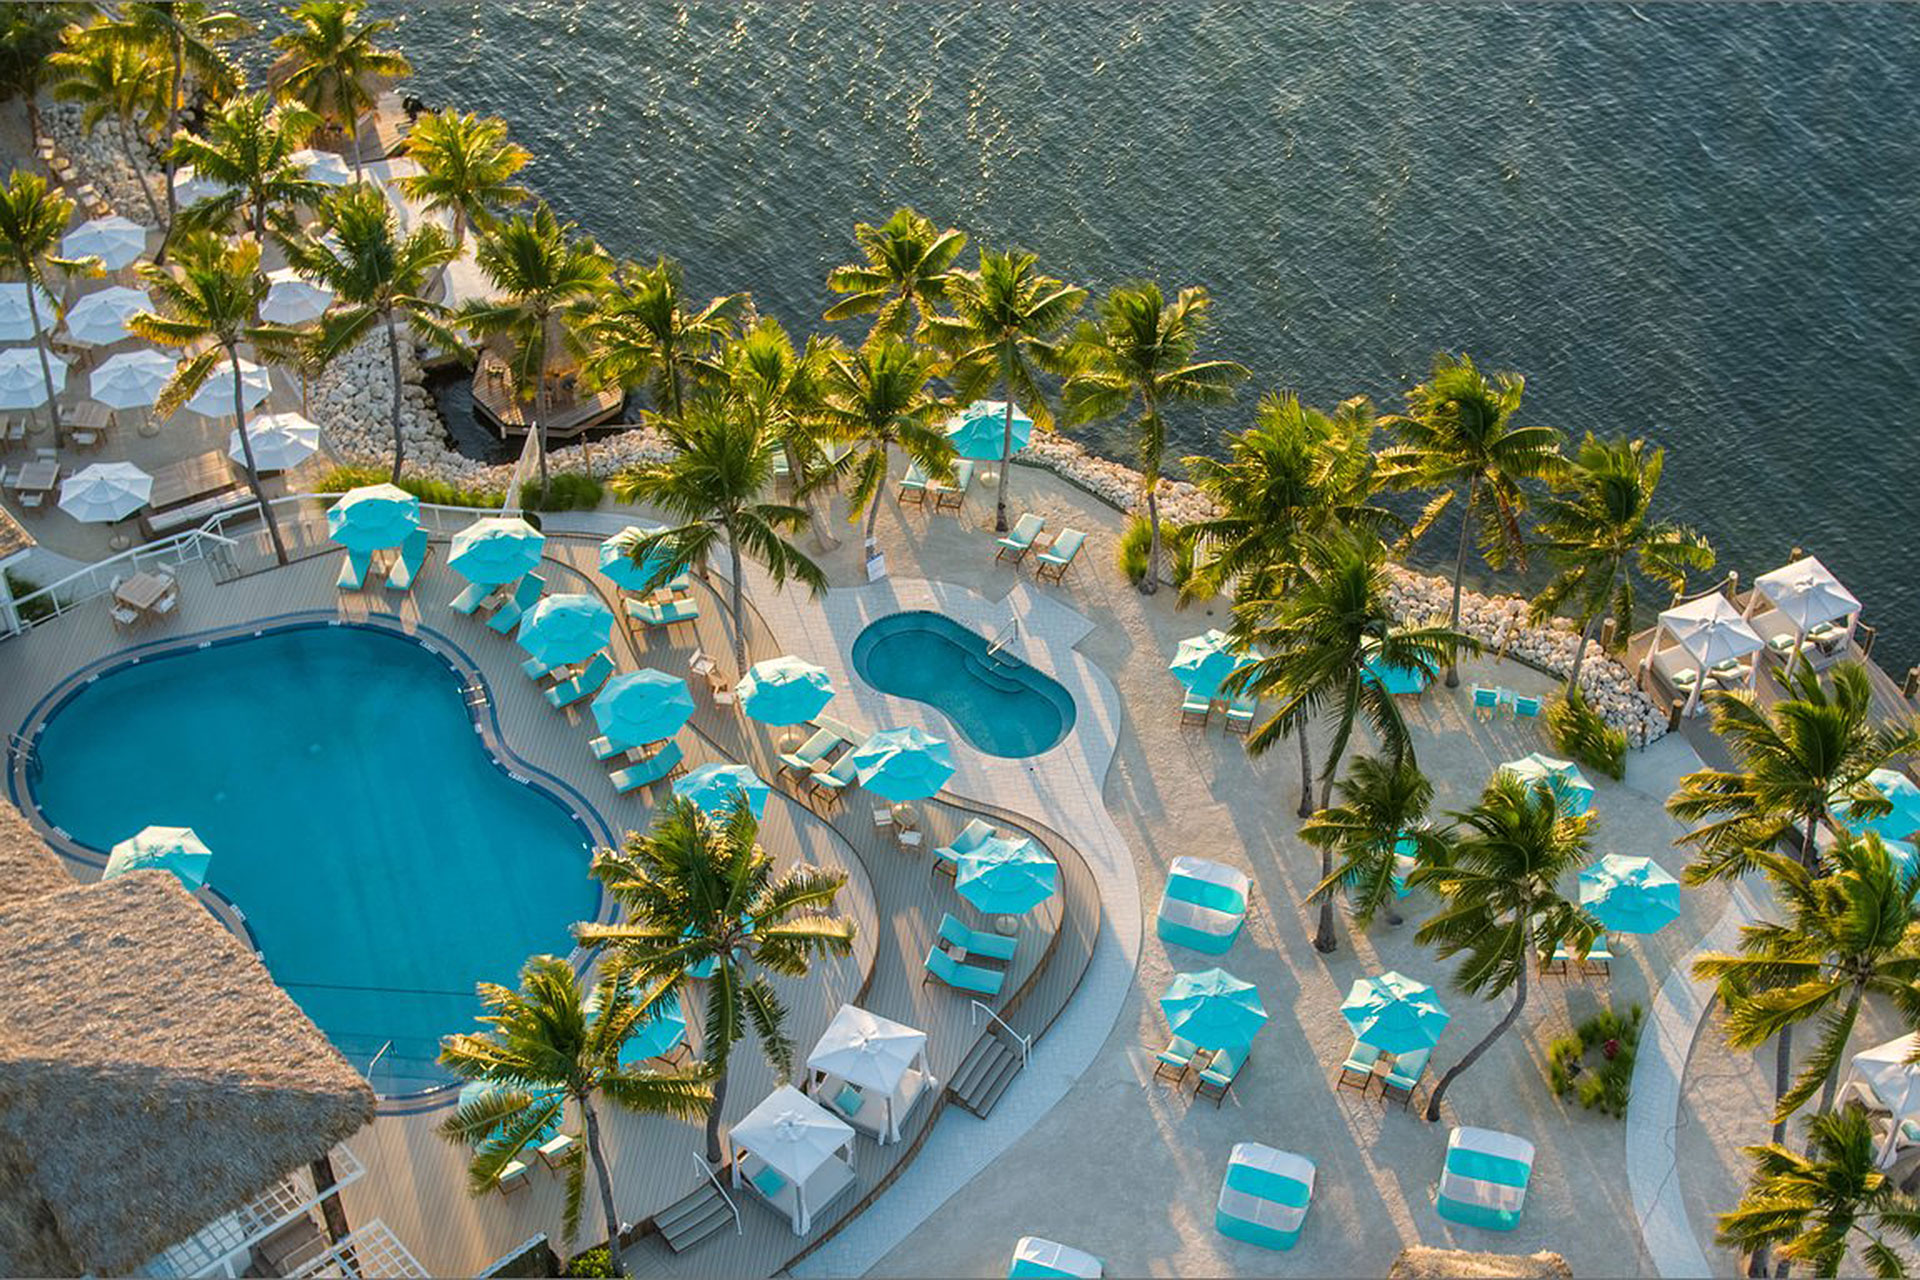 Aerial View of Bungalows Key Largo in Key Largo, FL